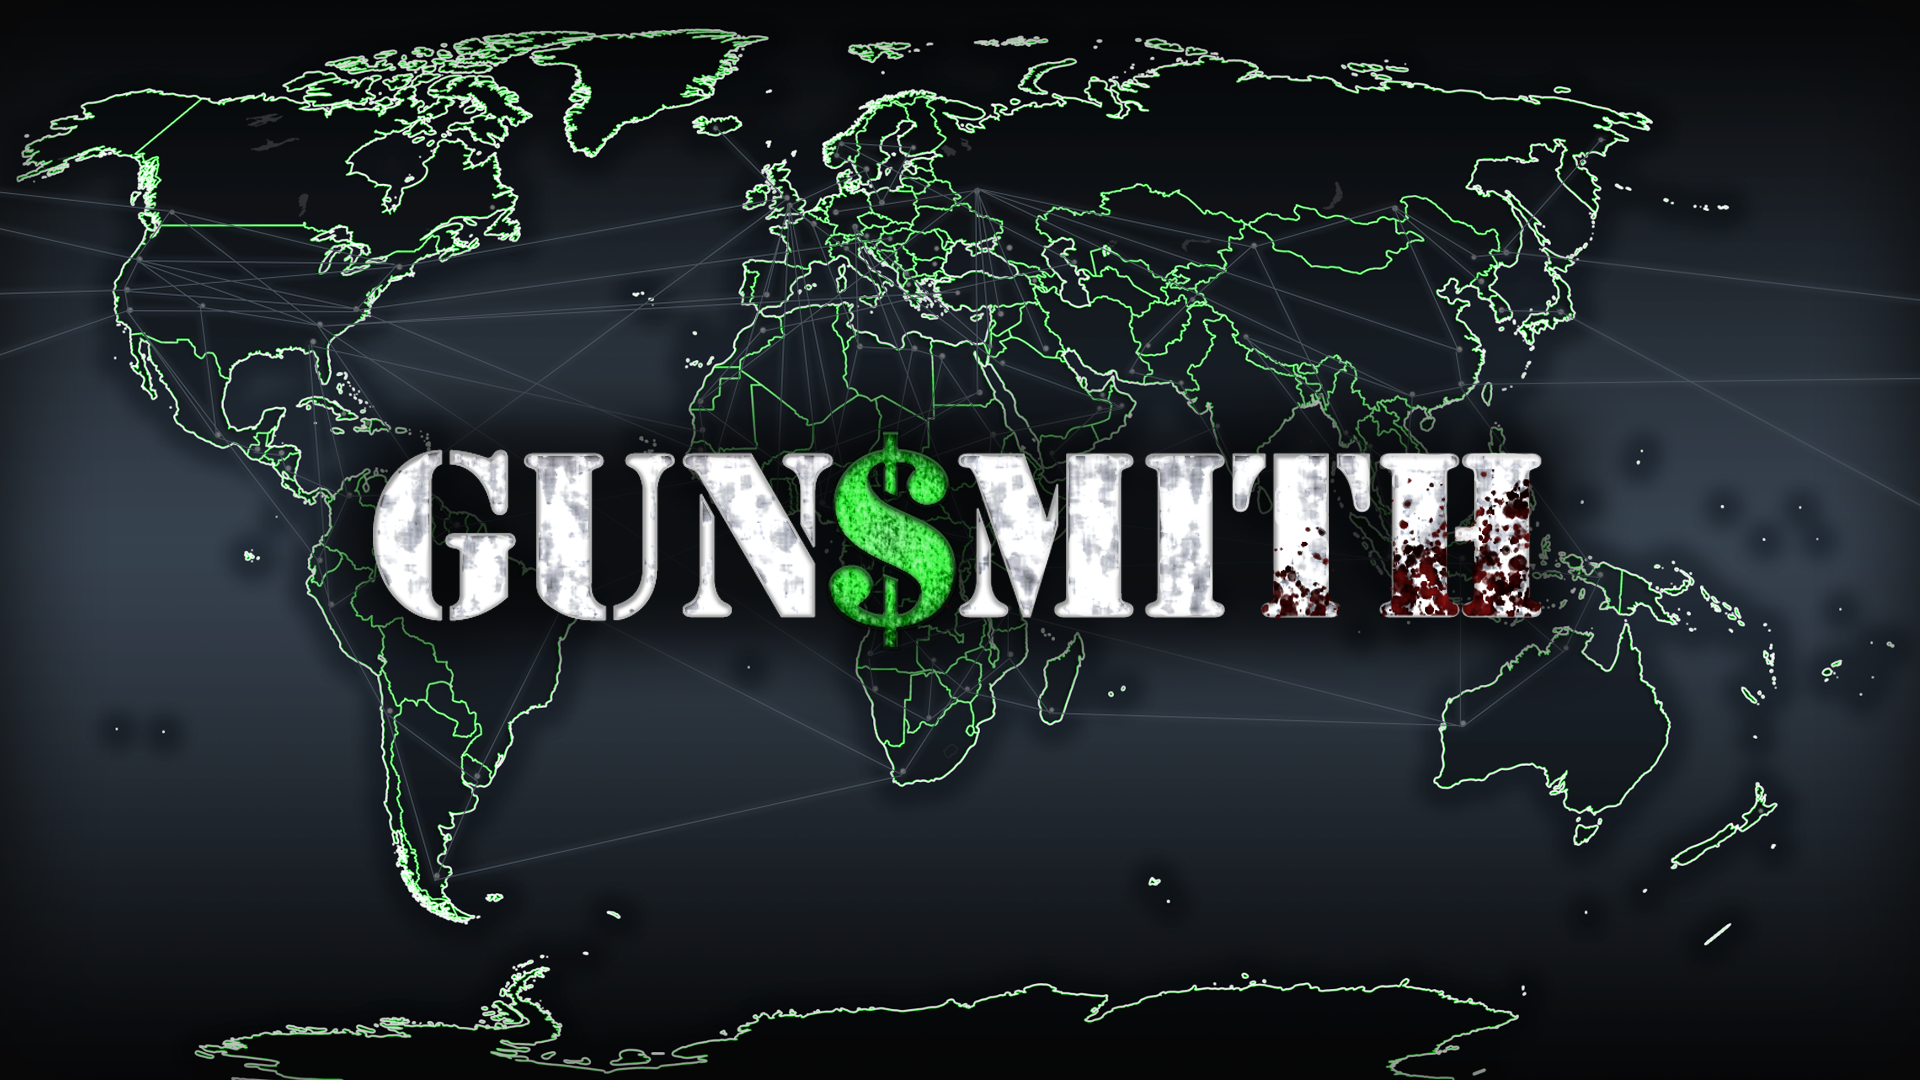 gunsmith 1920 2018